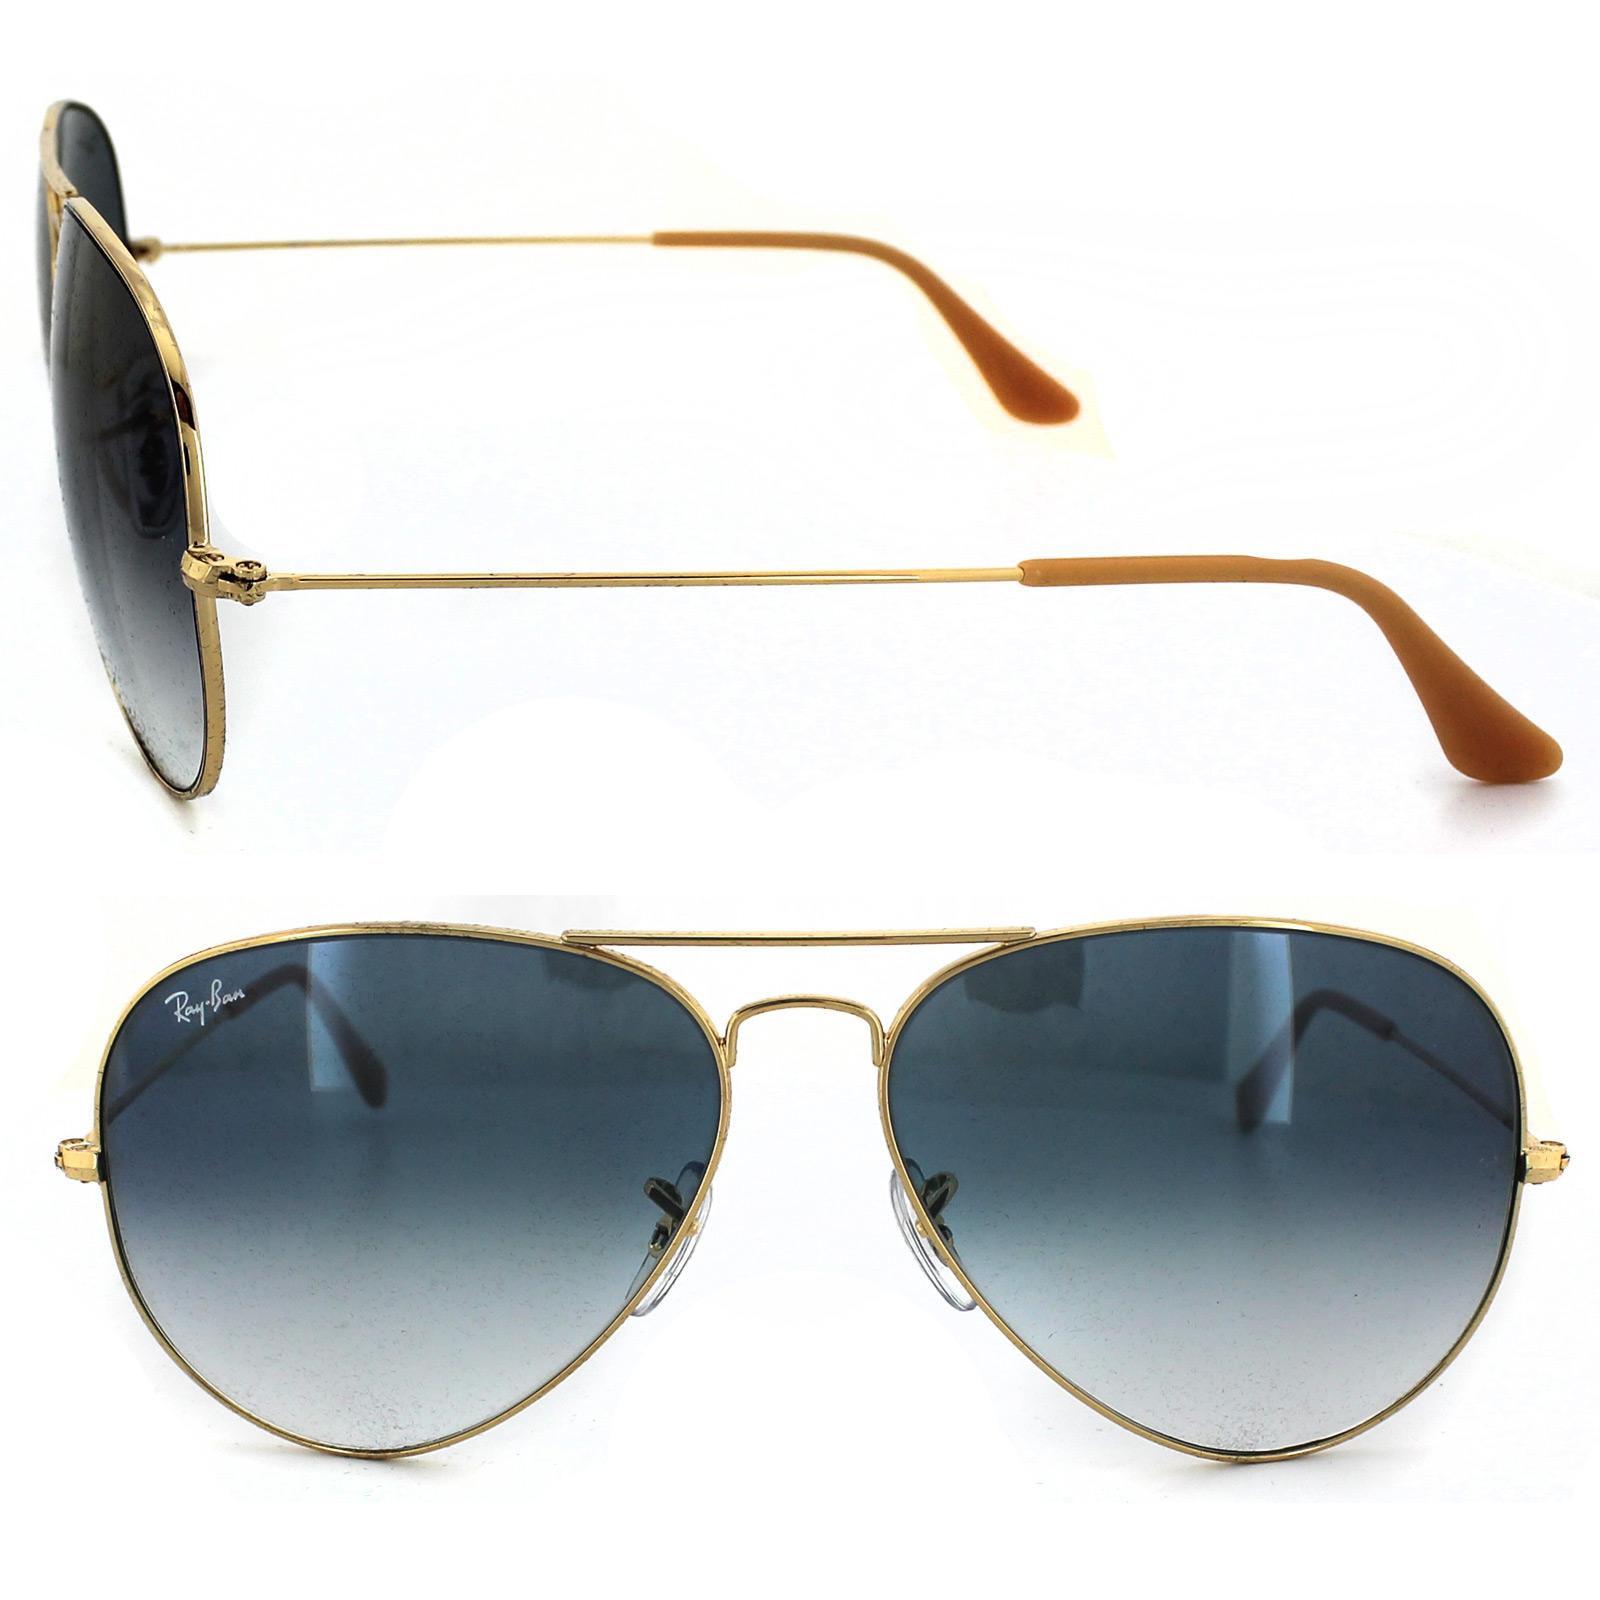 gafas de sol ray ban 3025